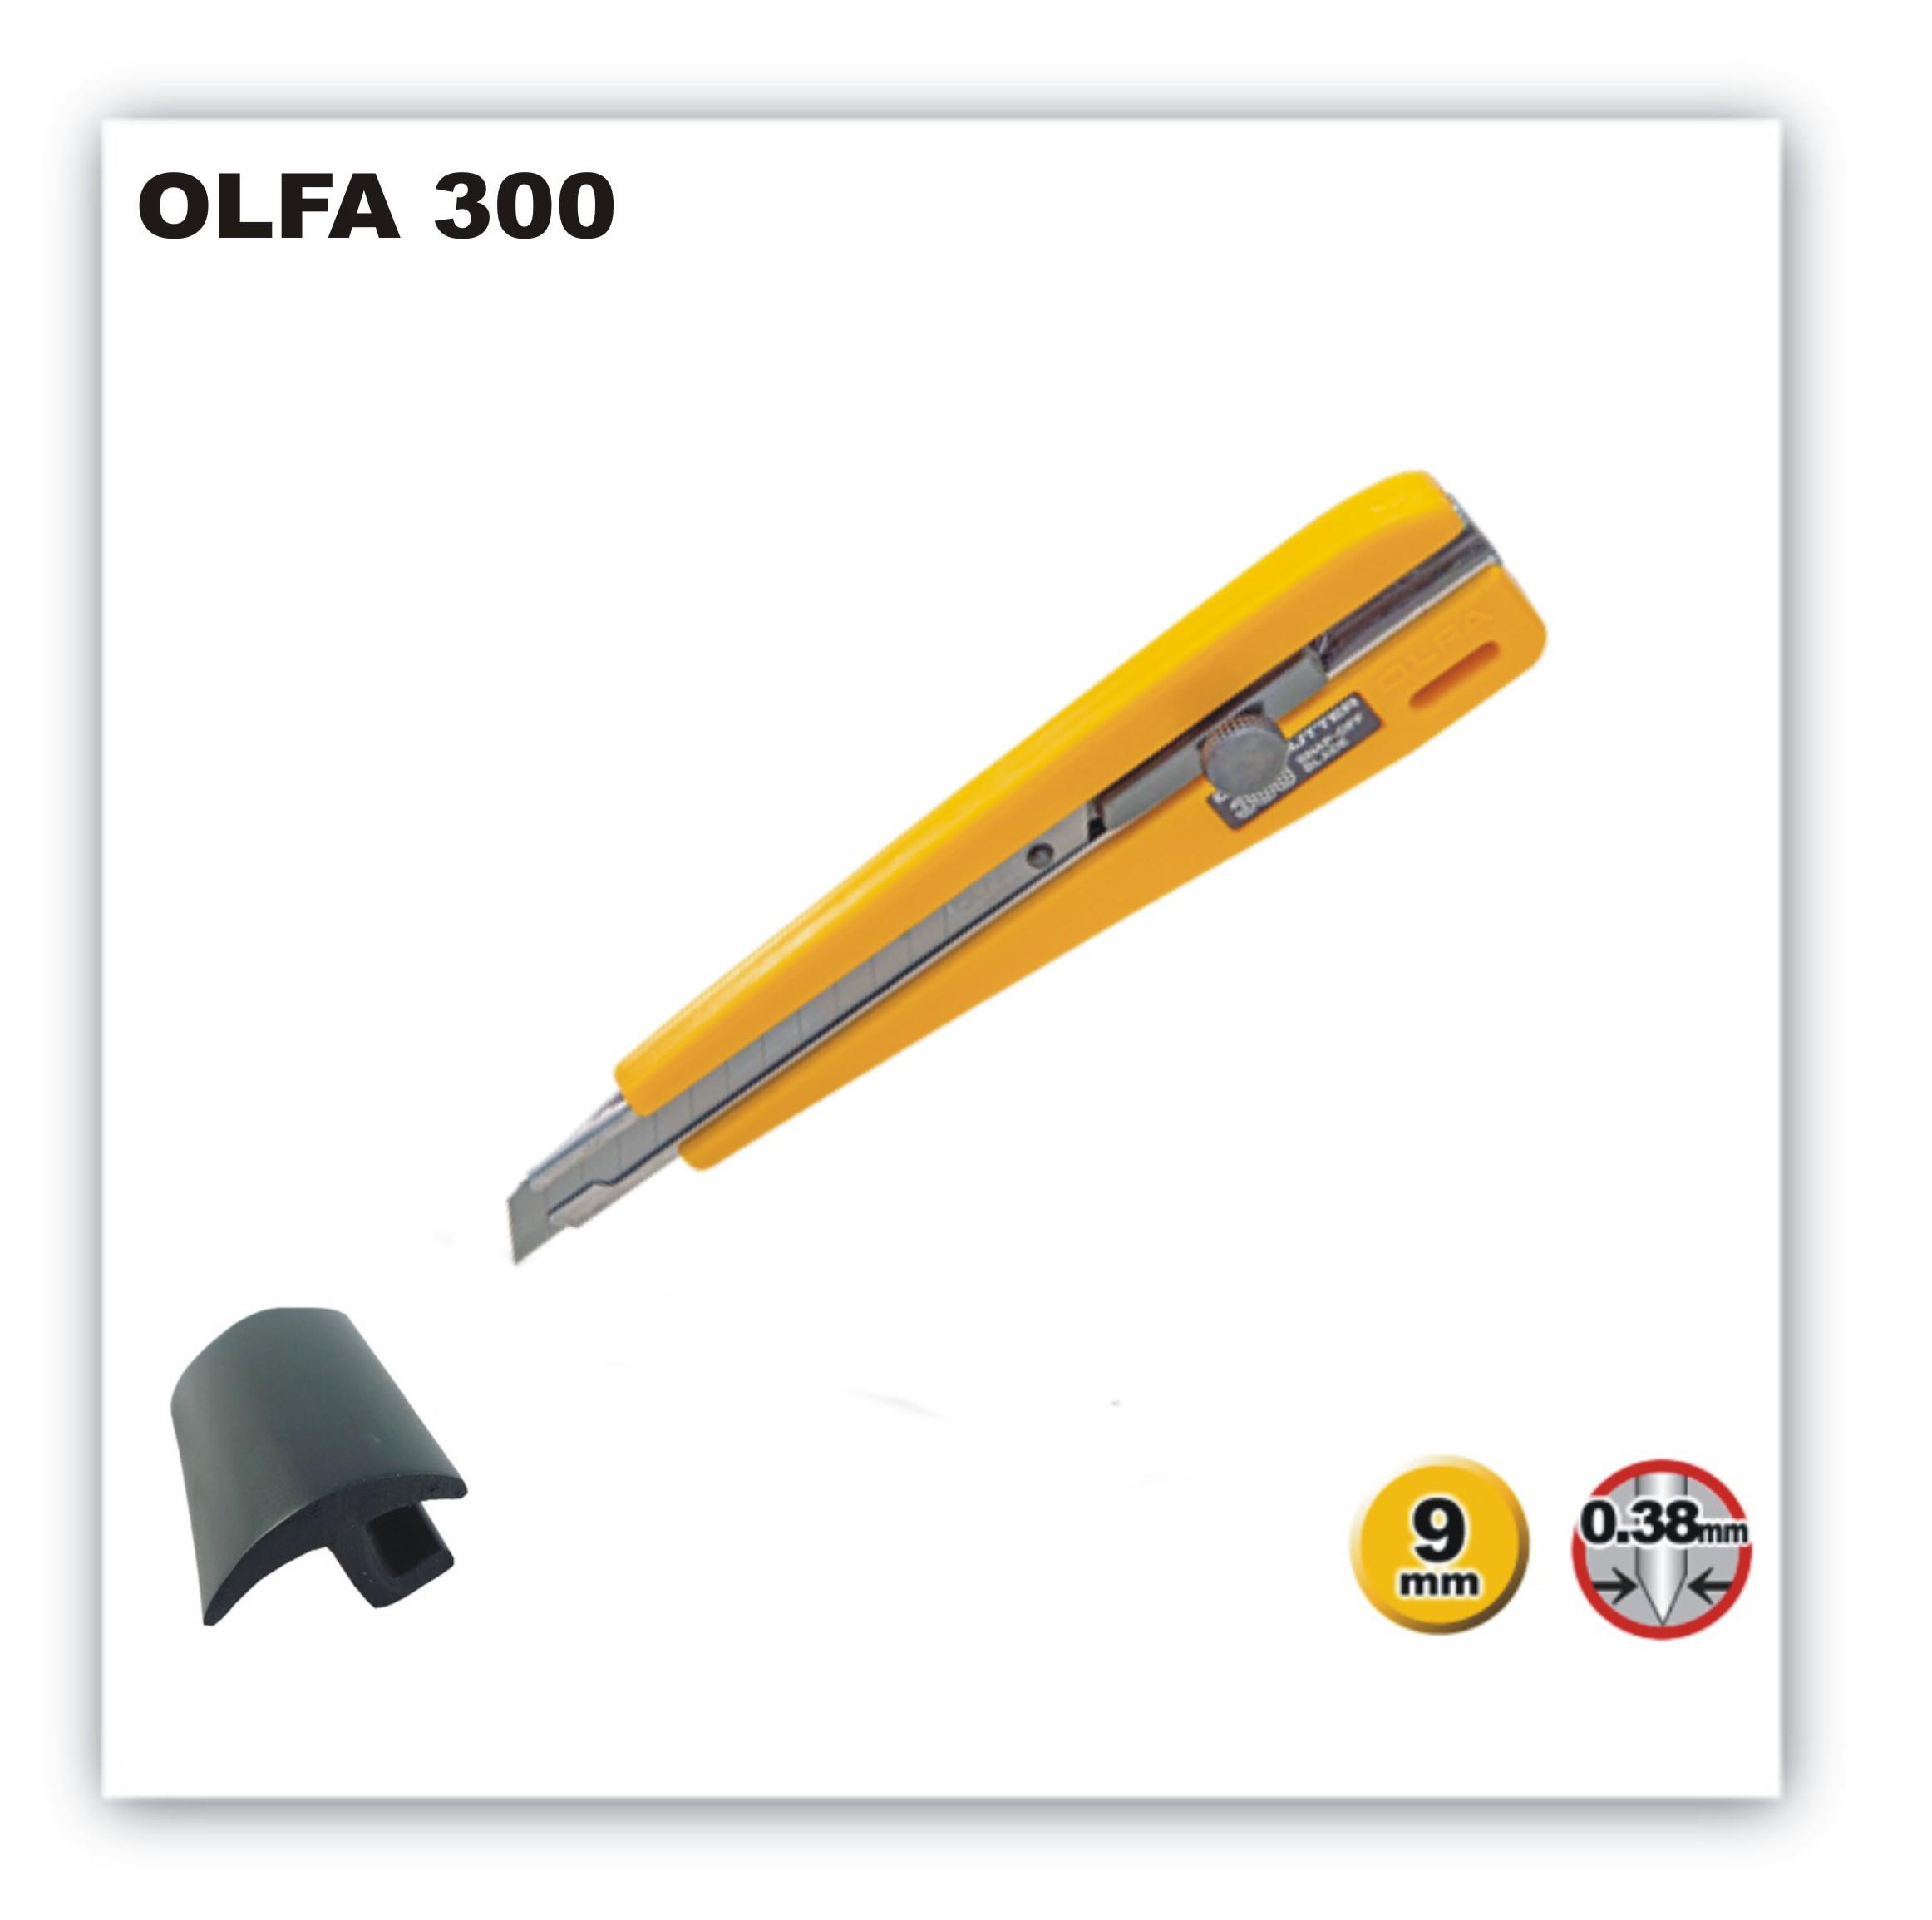 Standard Olfa kés - 9 mm ?OLFA 300